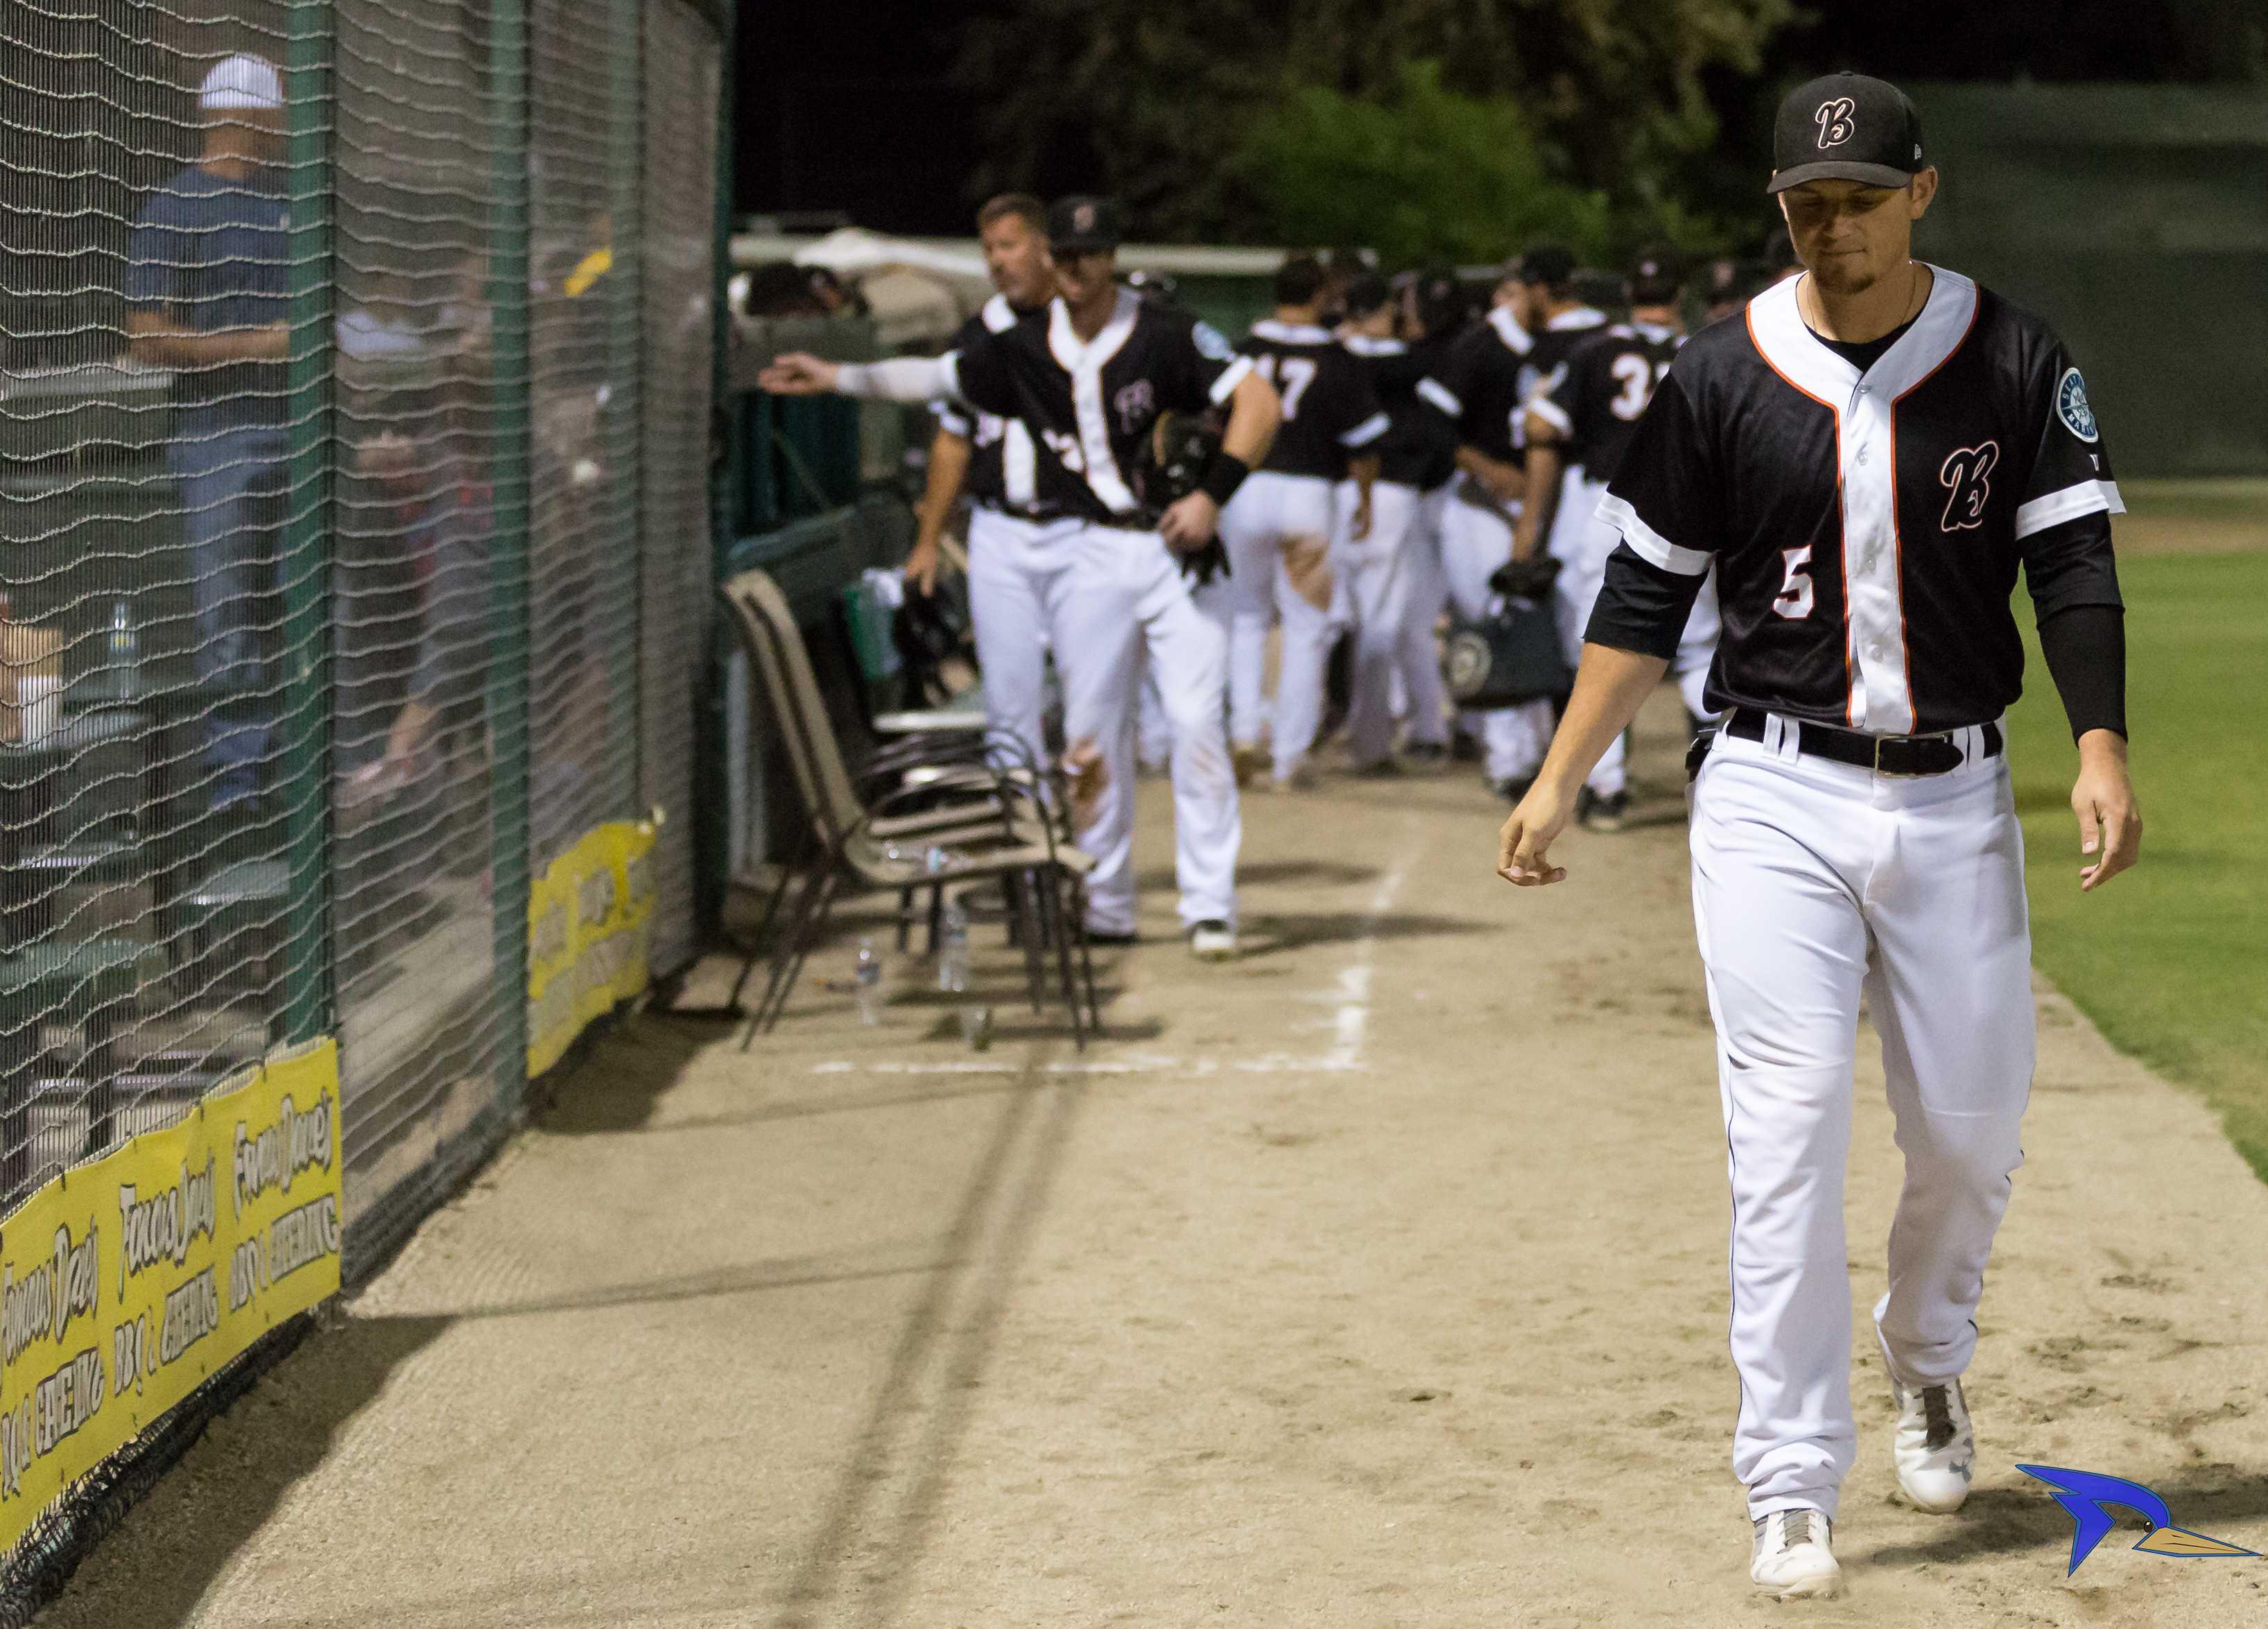 Blaze goes down in final game at Sam Lynn Ballpark